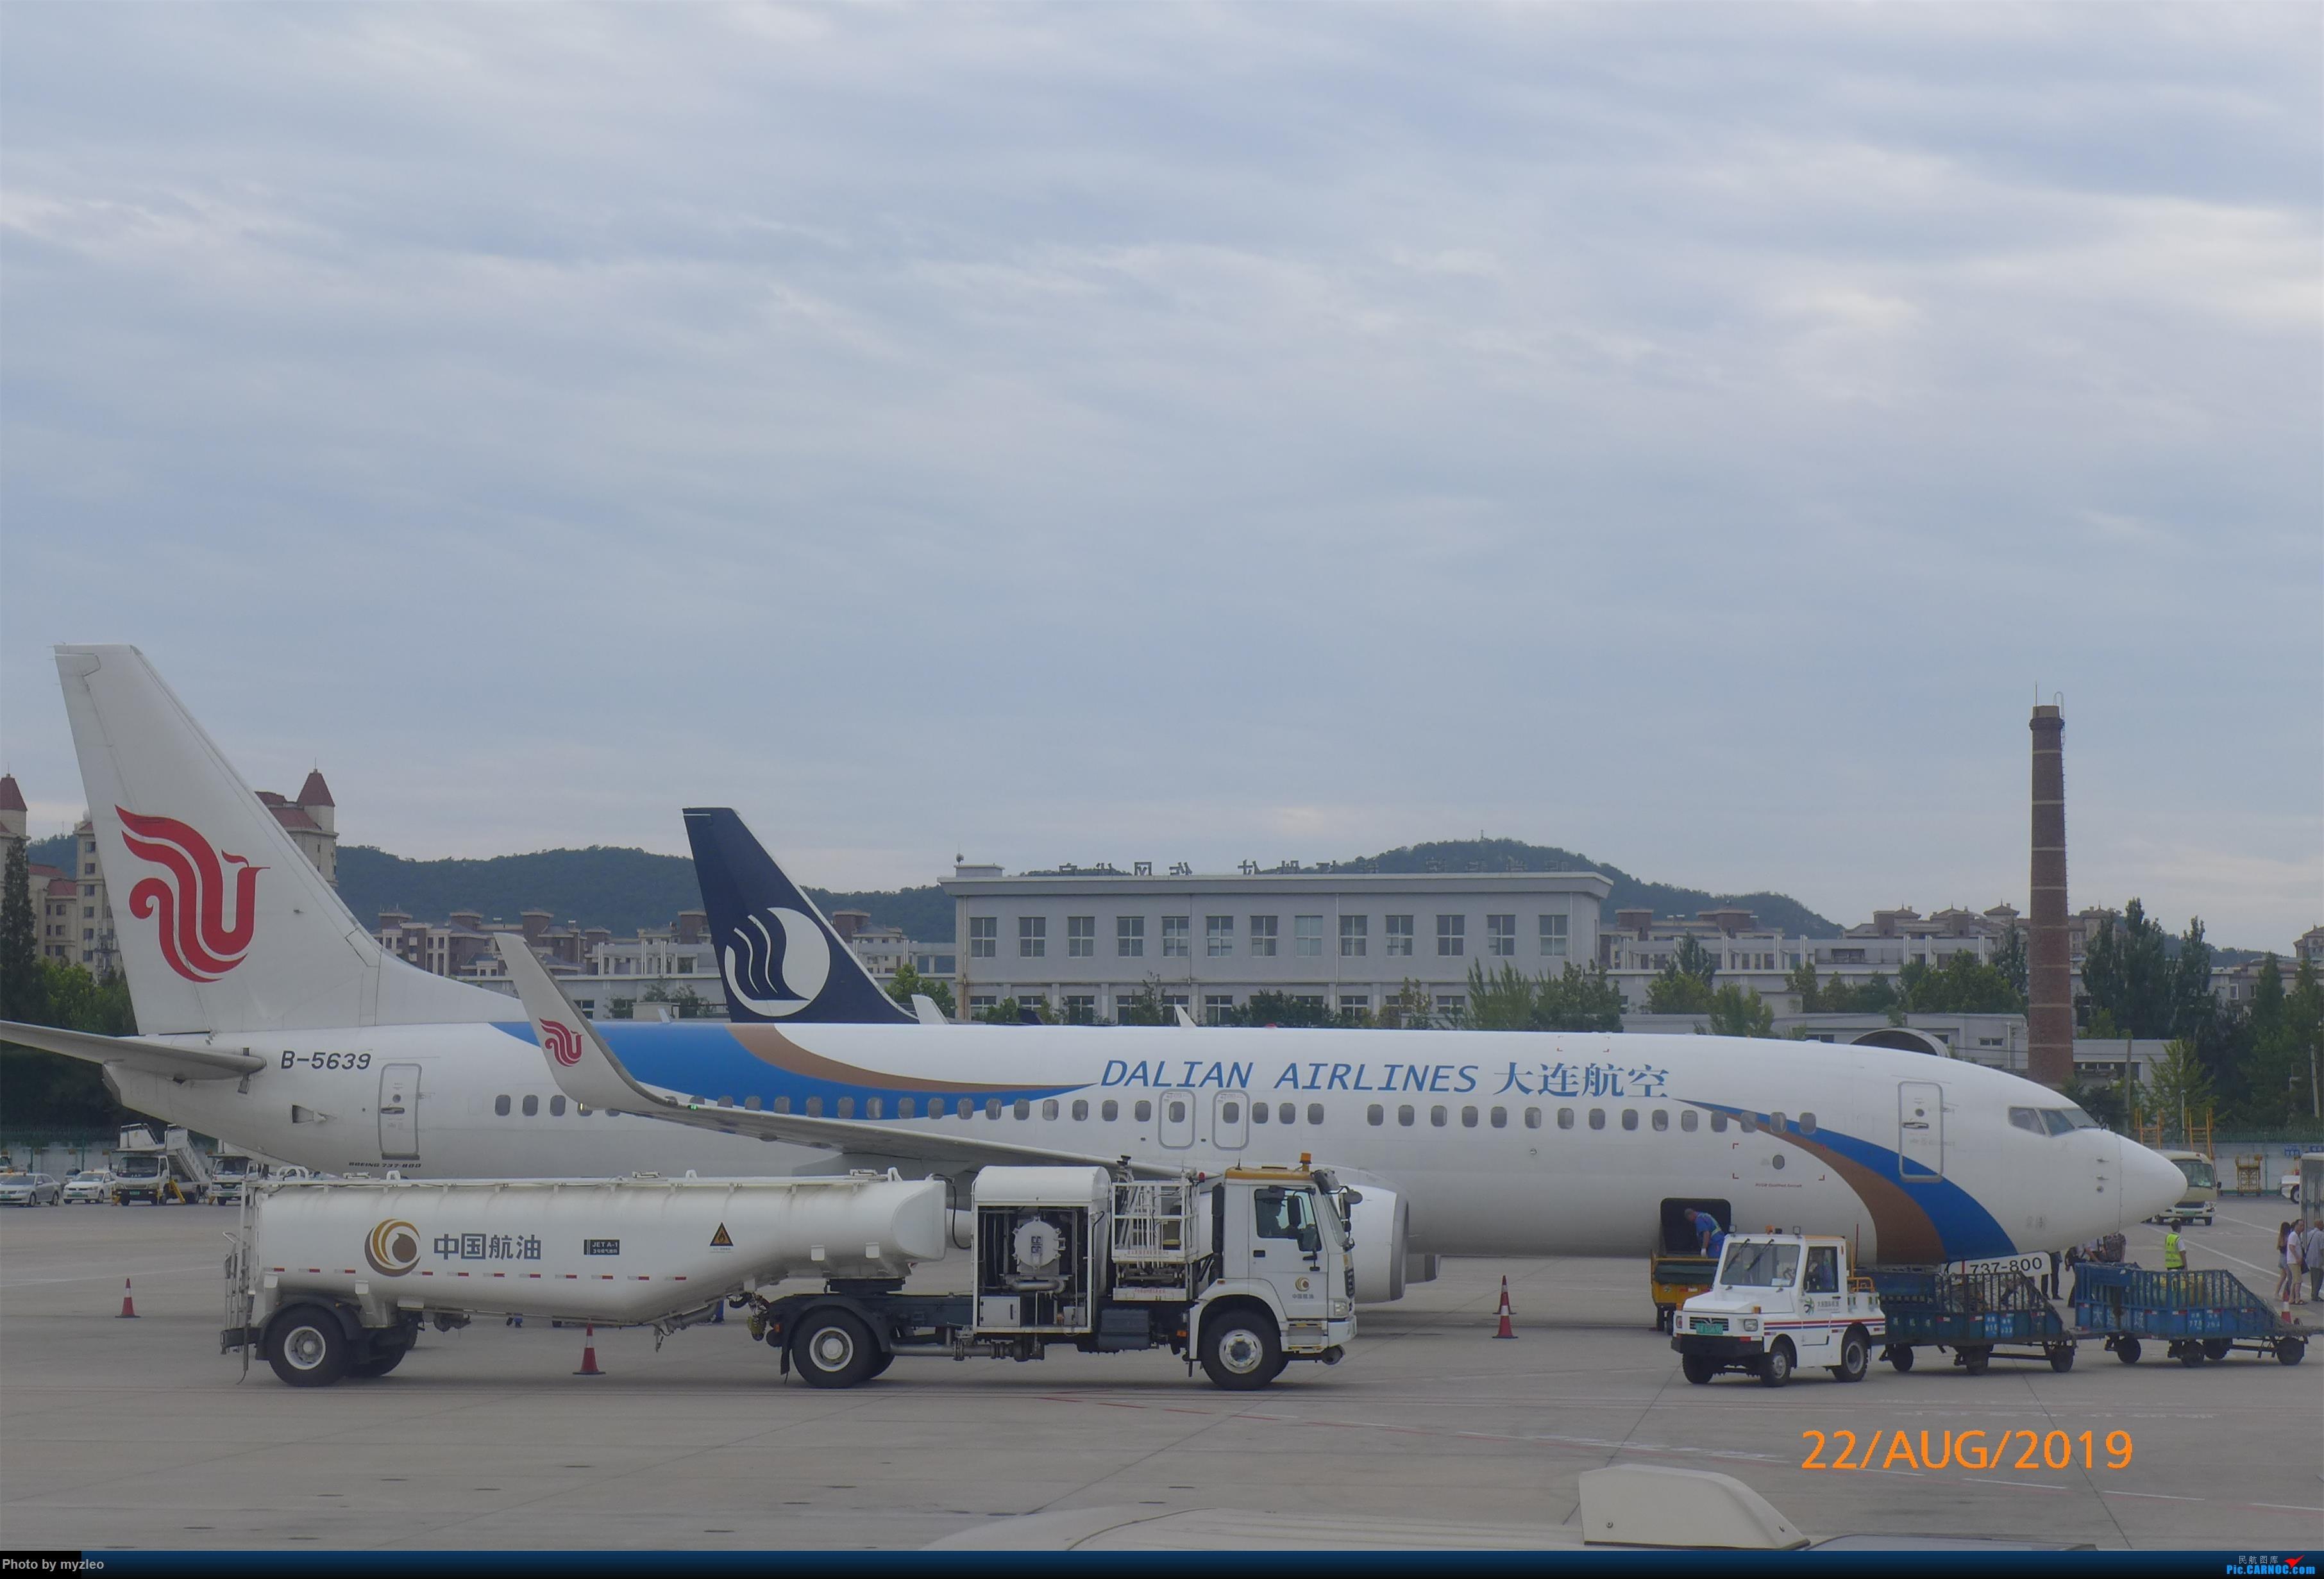 Re:[原创]【myzleo的游记5.2】梦圆一九(2)首访南苑把梦圆,初搭巴航连新缘 BOEING 737-800 B-5639 中国大连国际机场